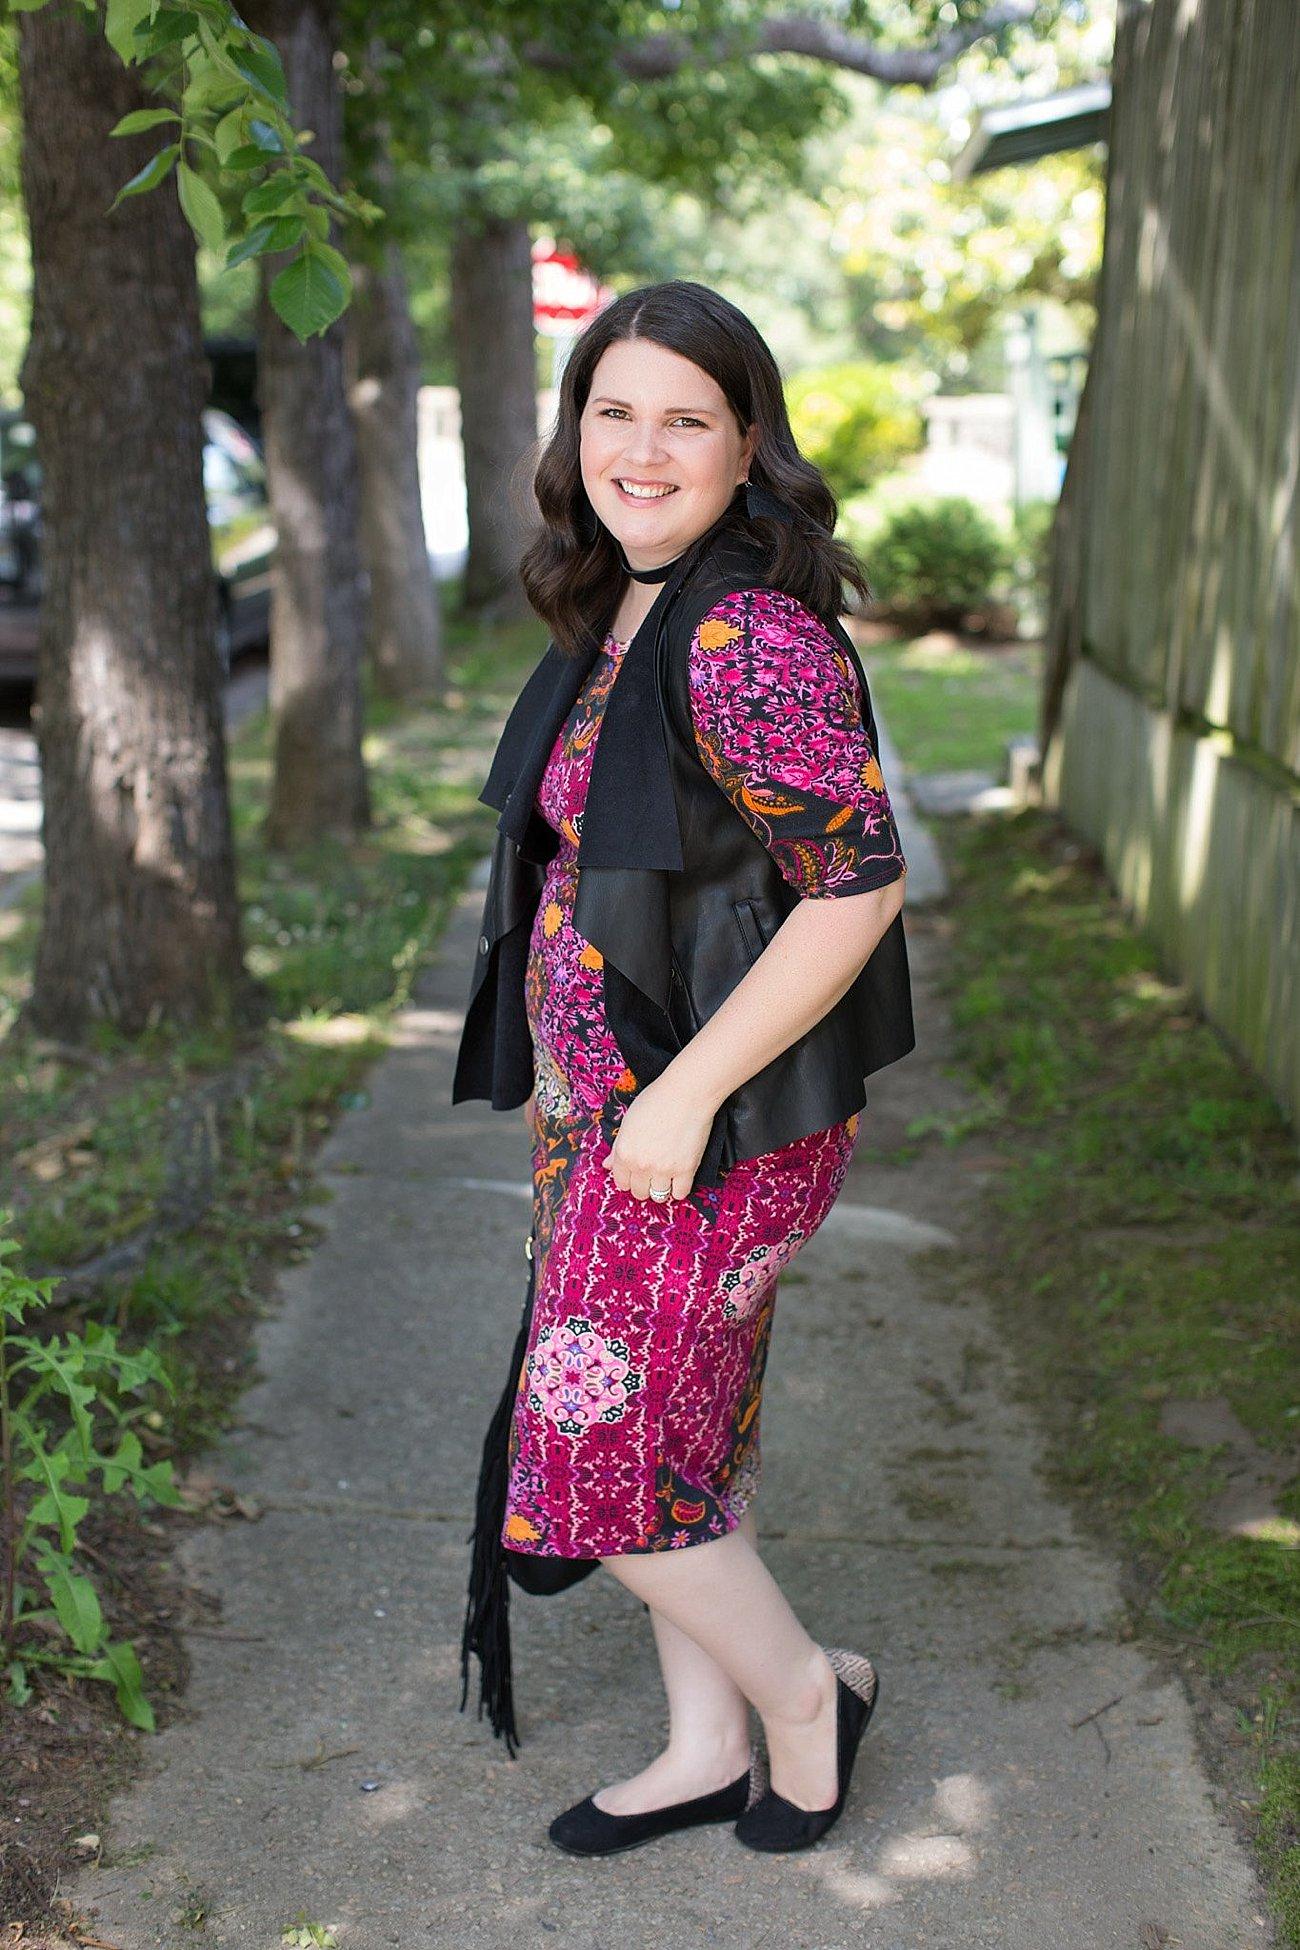 LulaRoe Julia Dress, Stitch Fix Kut From the Kloth Leather Vest, Nickel & Suede Earrings, Nickel & Suede Choker   North Carolina Fashion & Style Blogger (1)